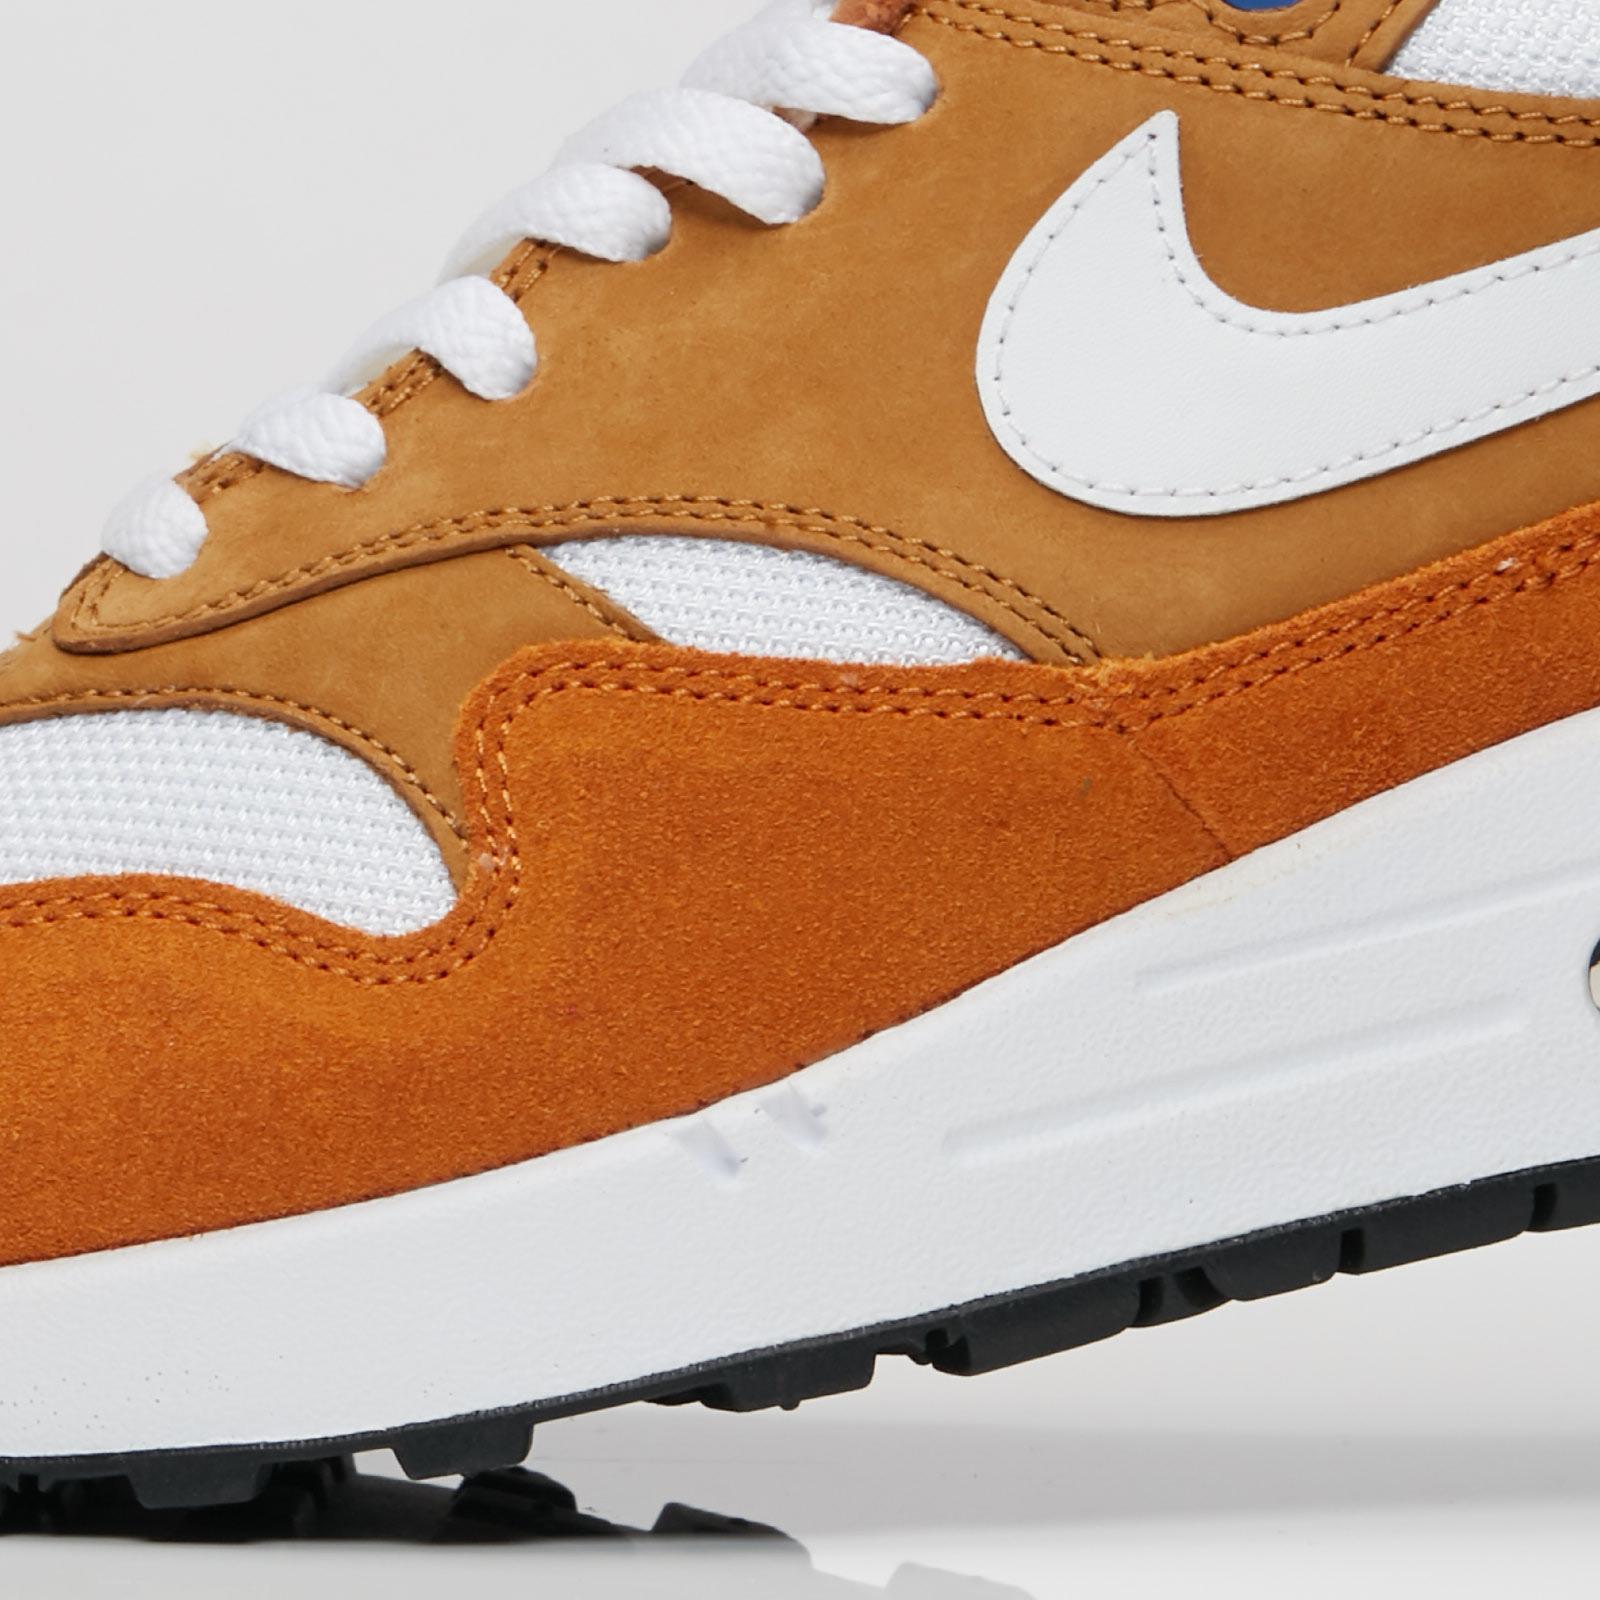 Nike Air Max 1 Premium Retro 908366 700 Sneakersnstuff